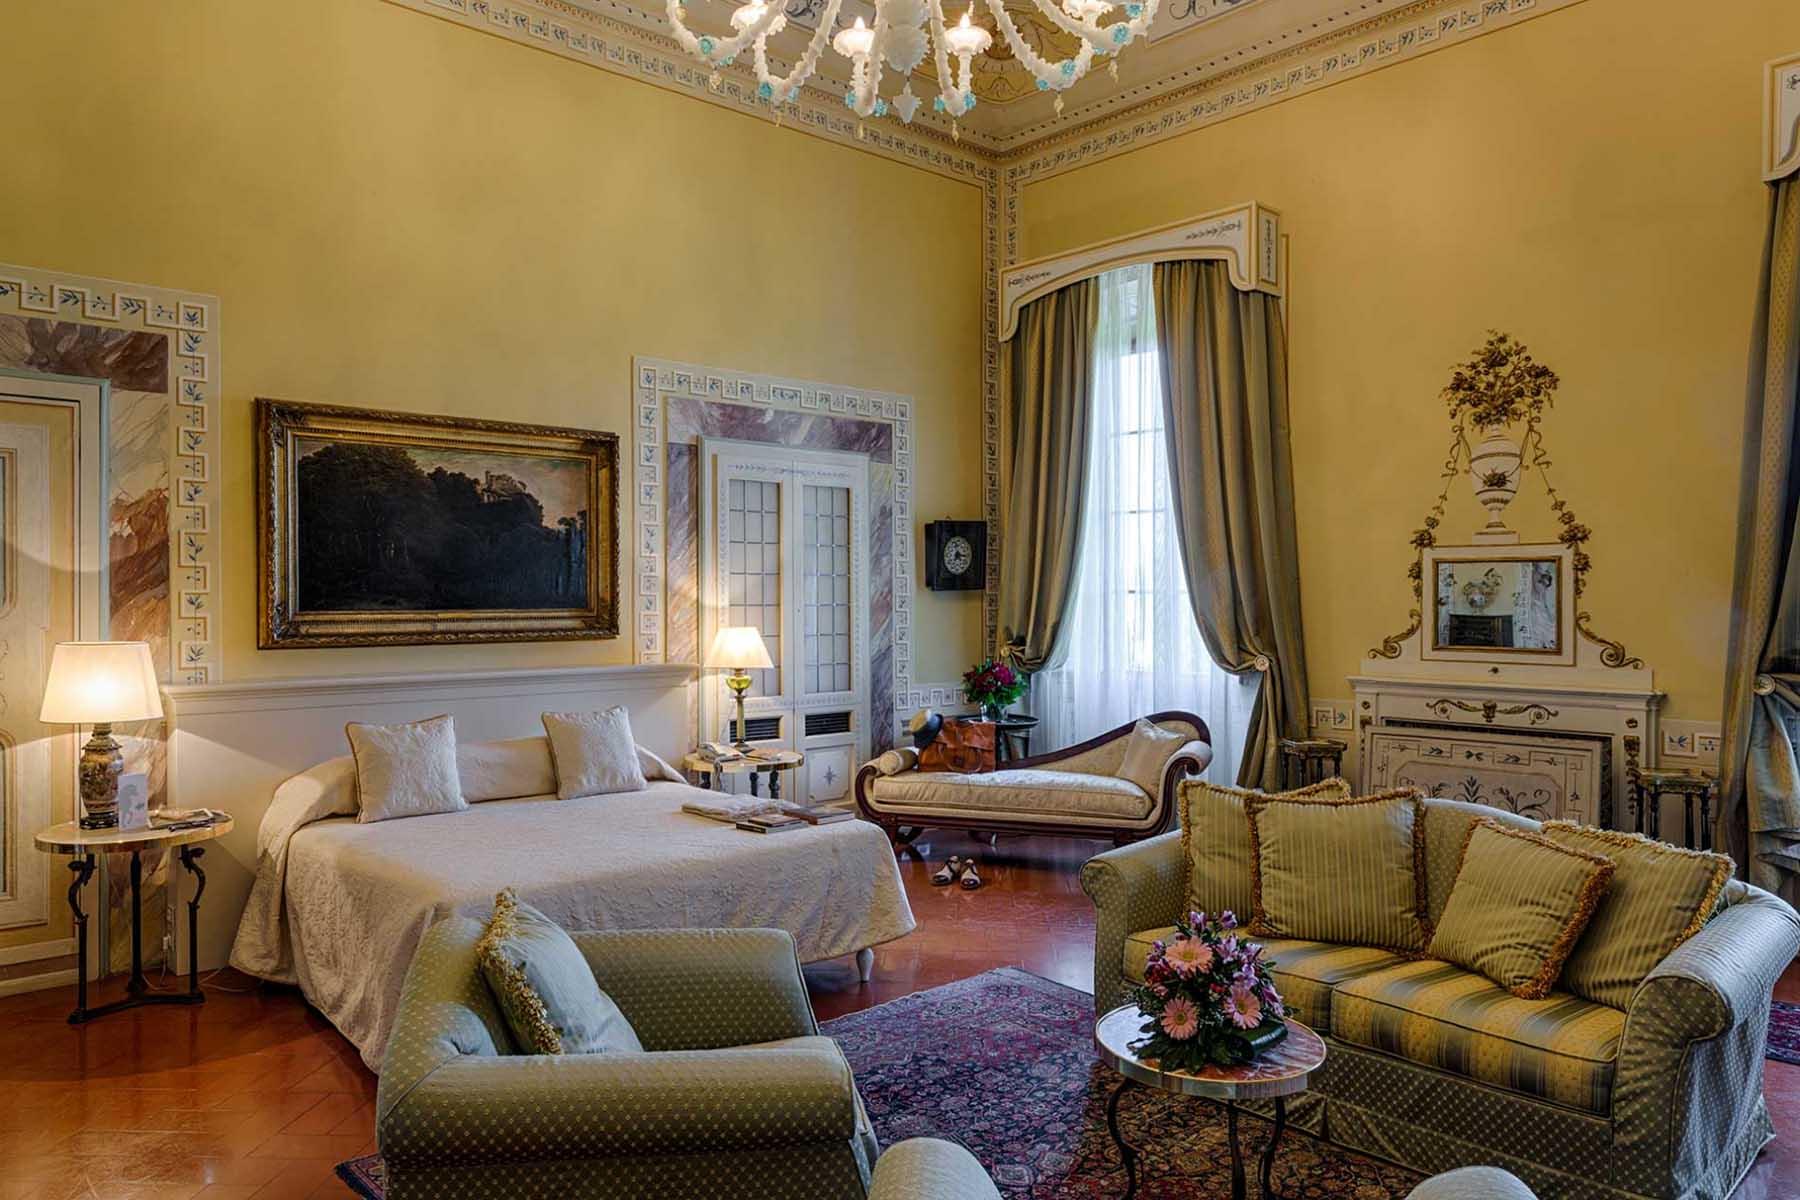 Hotell ved Firenze